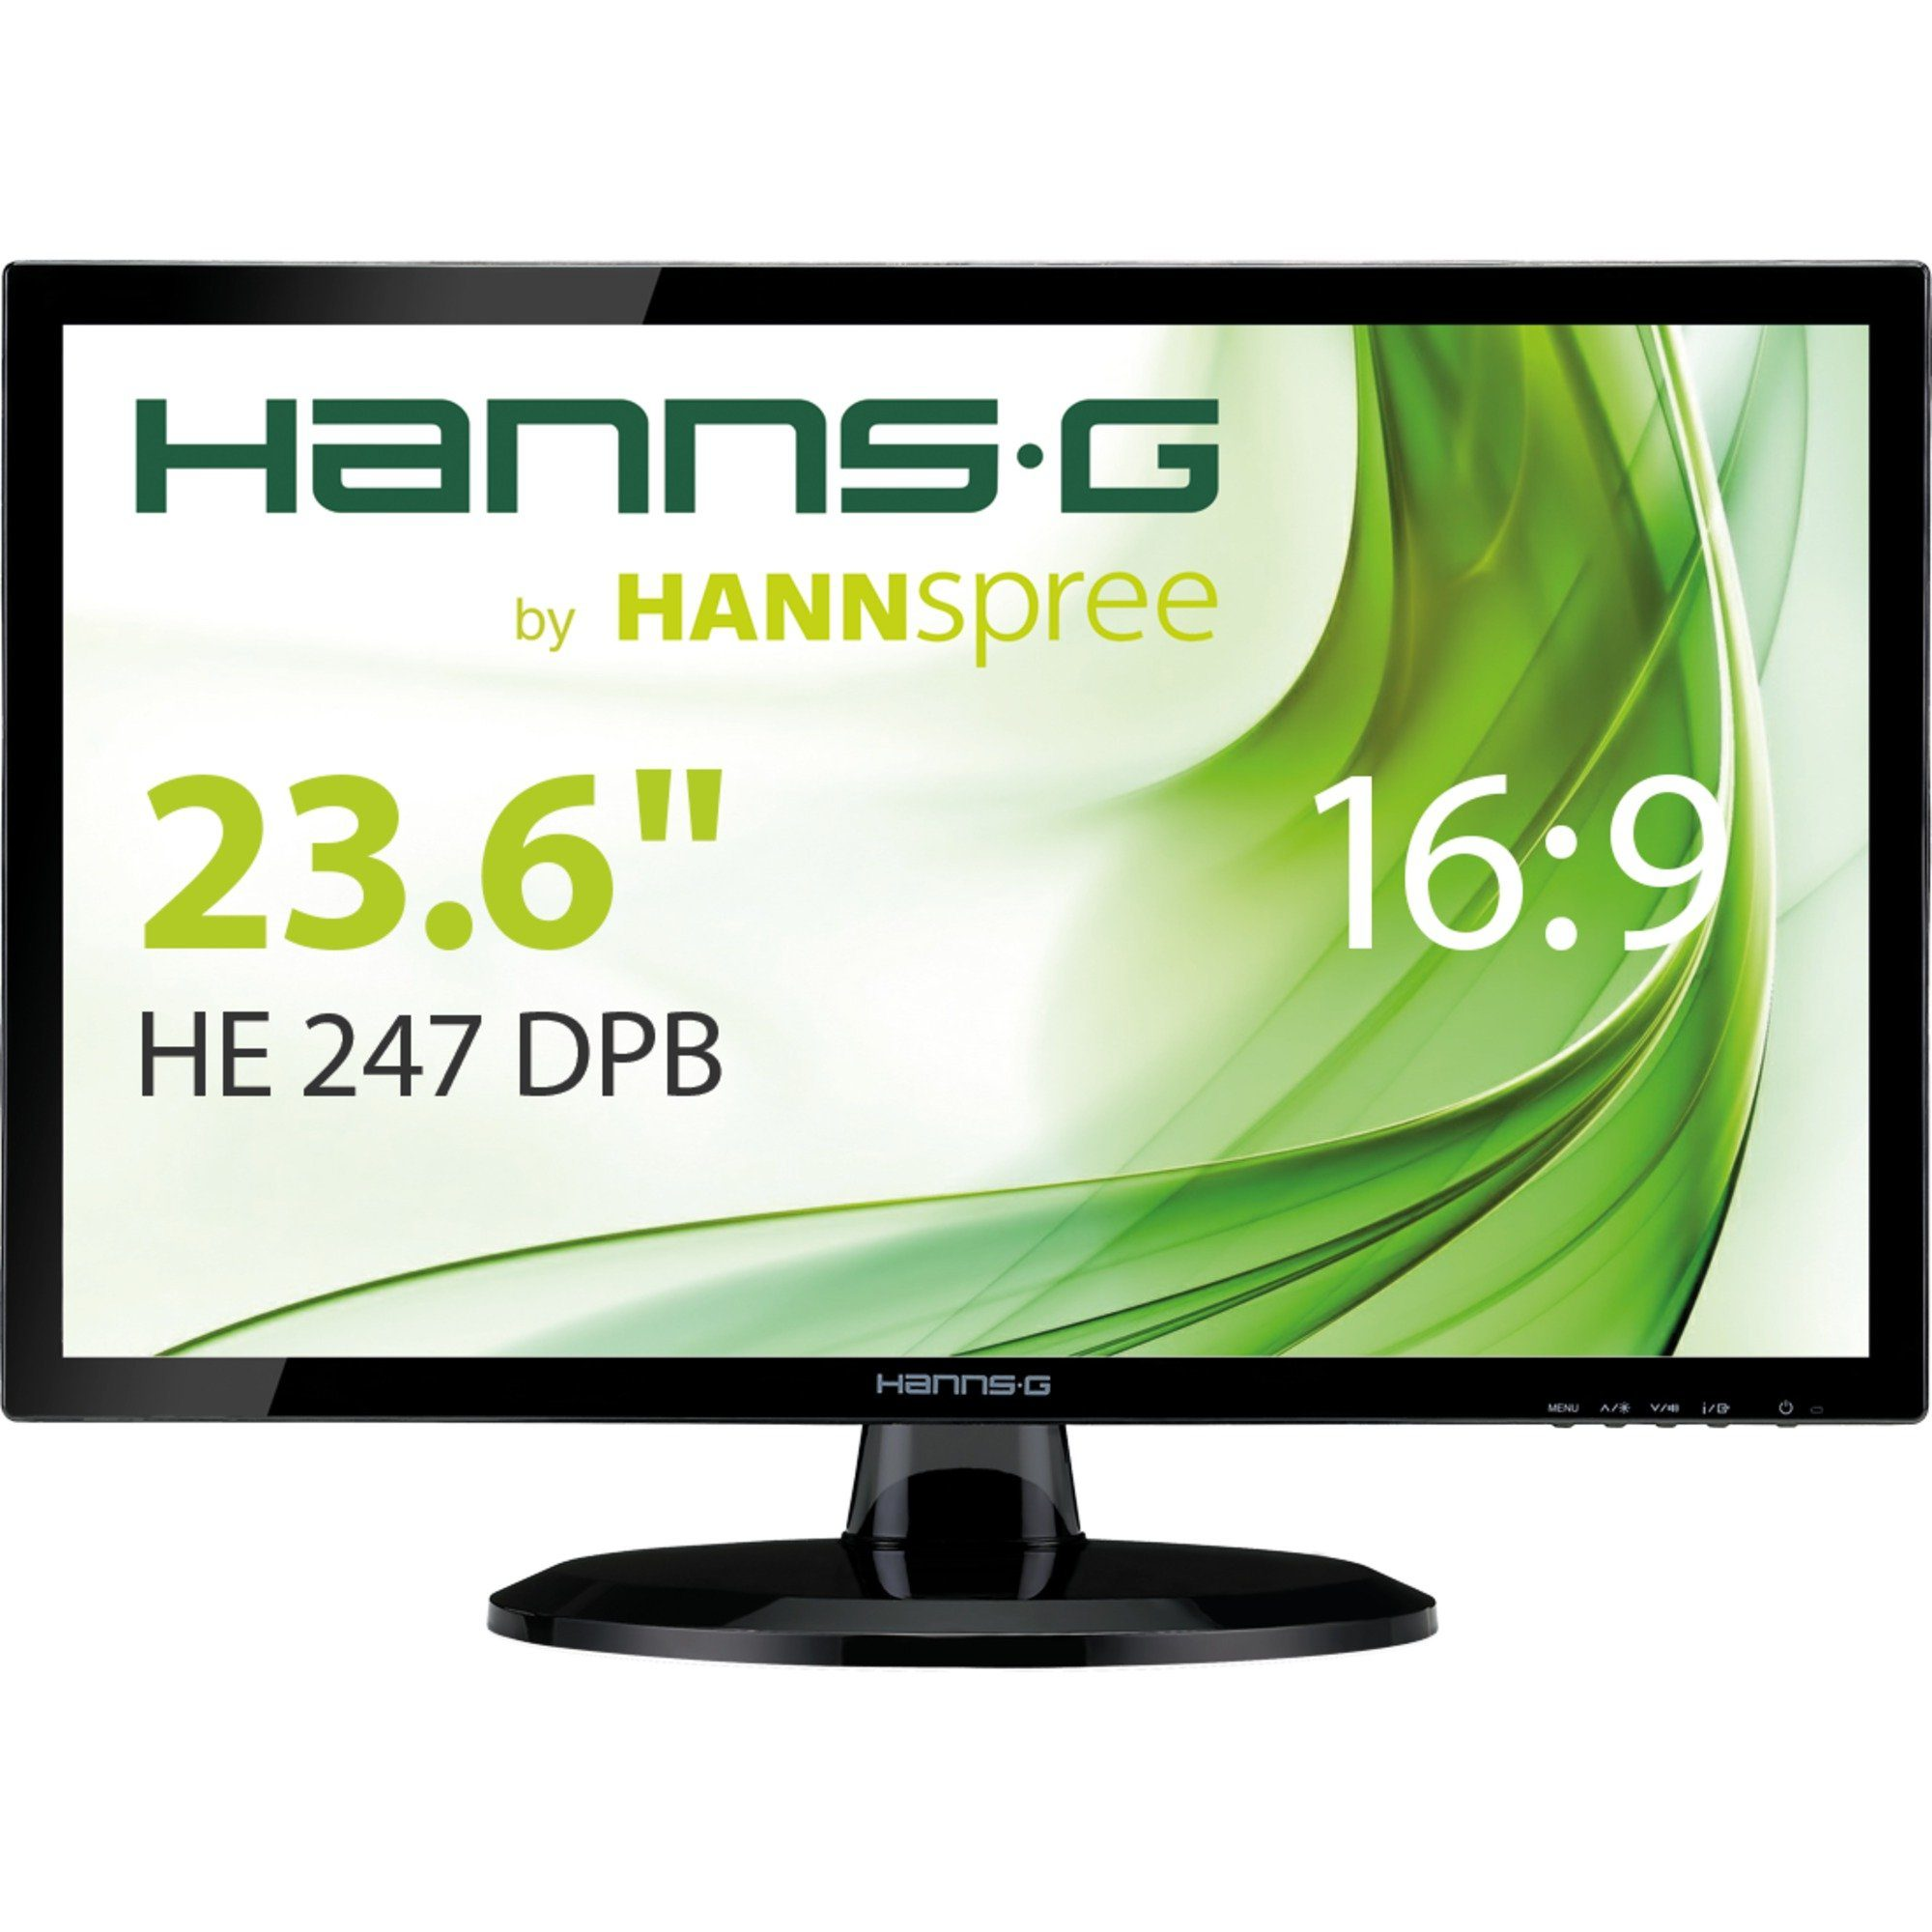 HannsG LED-Monitor »HE247DPB«